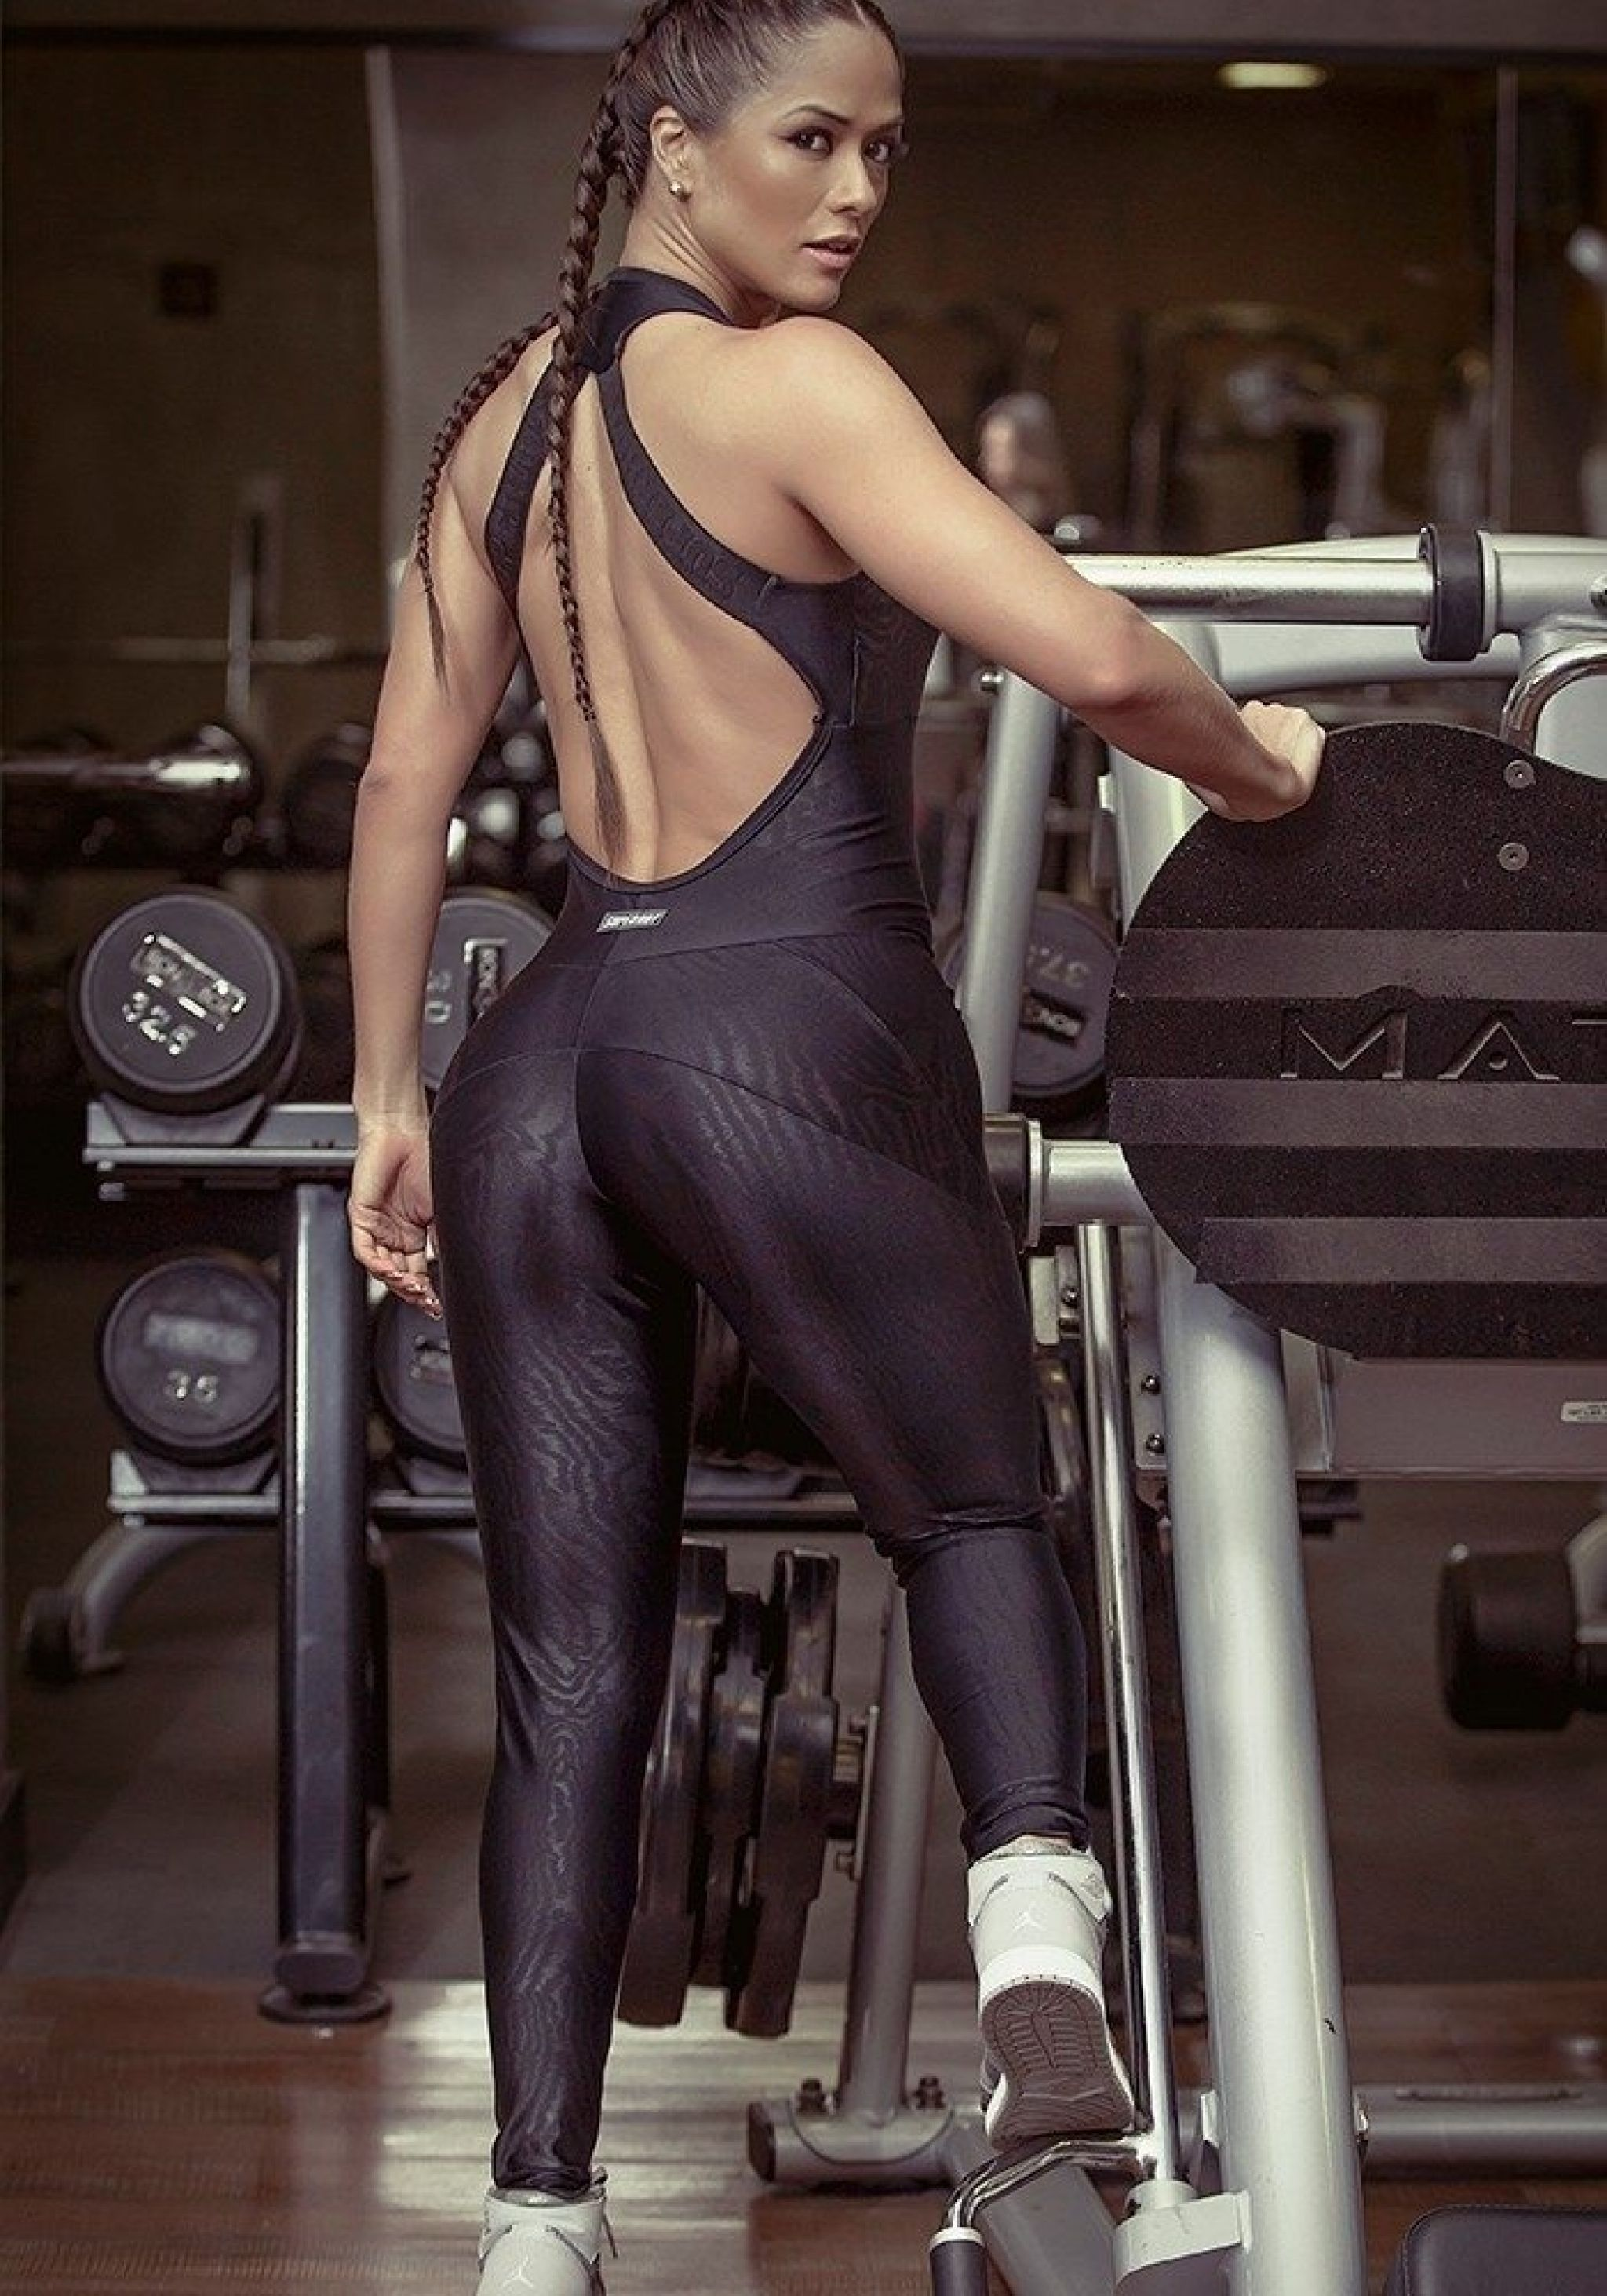 25afc4f1b8c SUPERHOT Sexy Workout Leggings Jumpsuit Romper MAC633